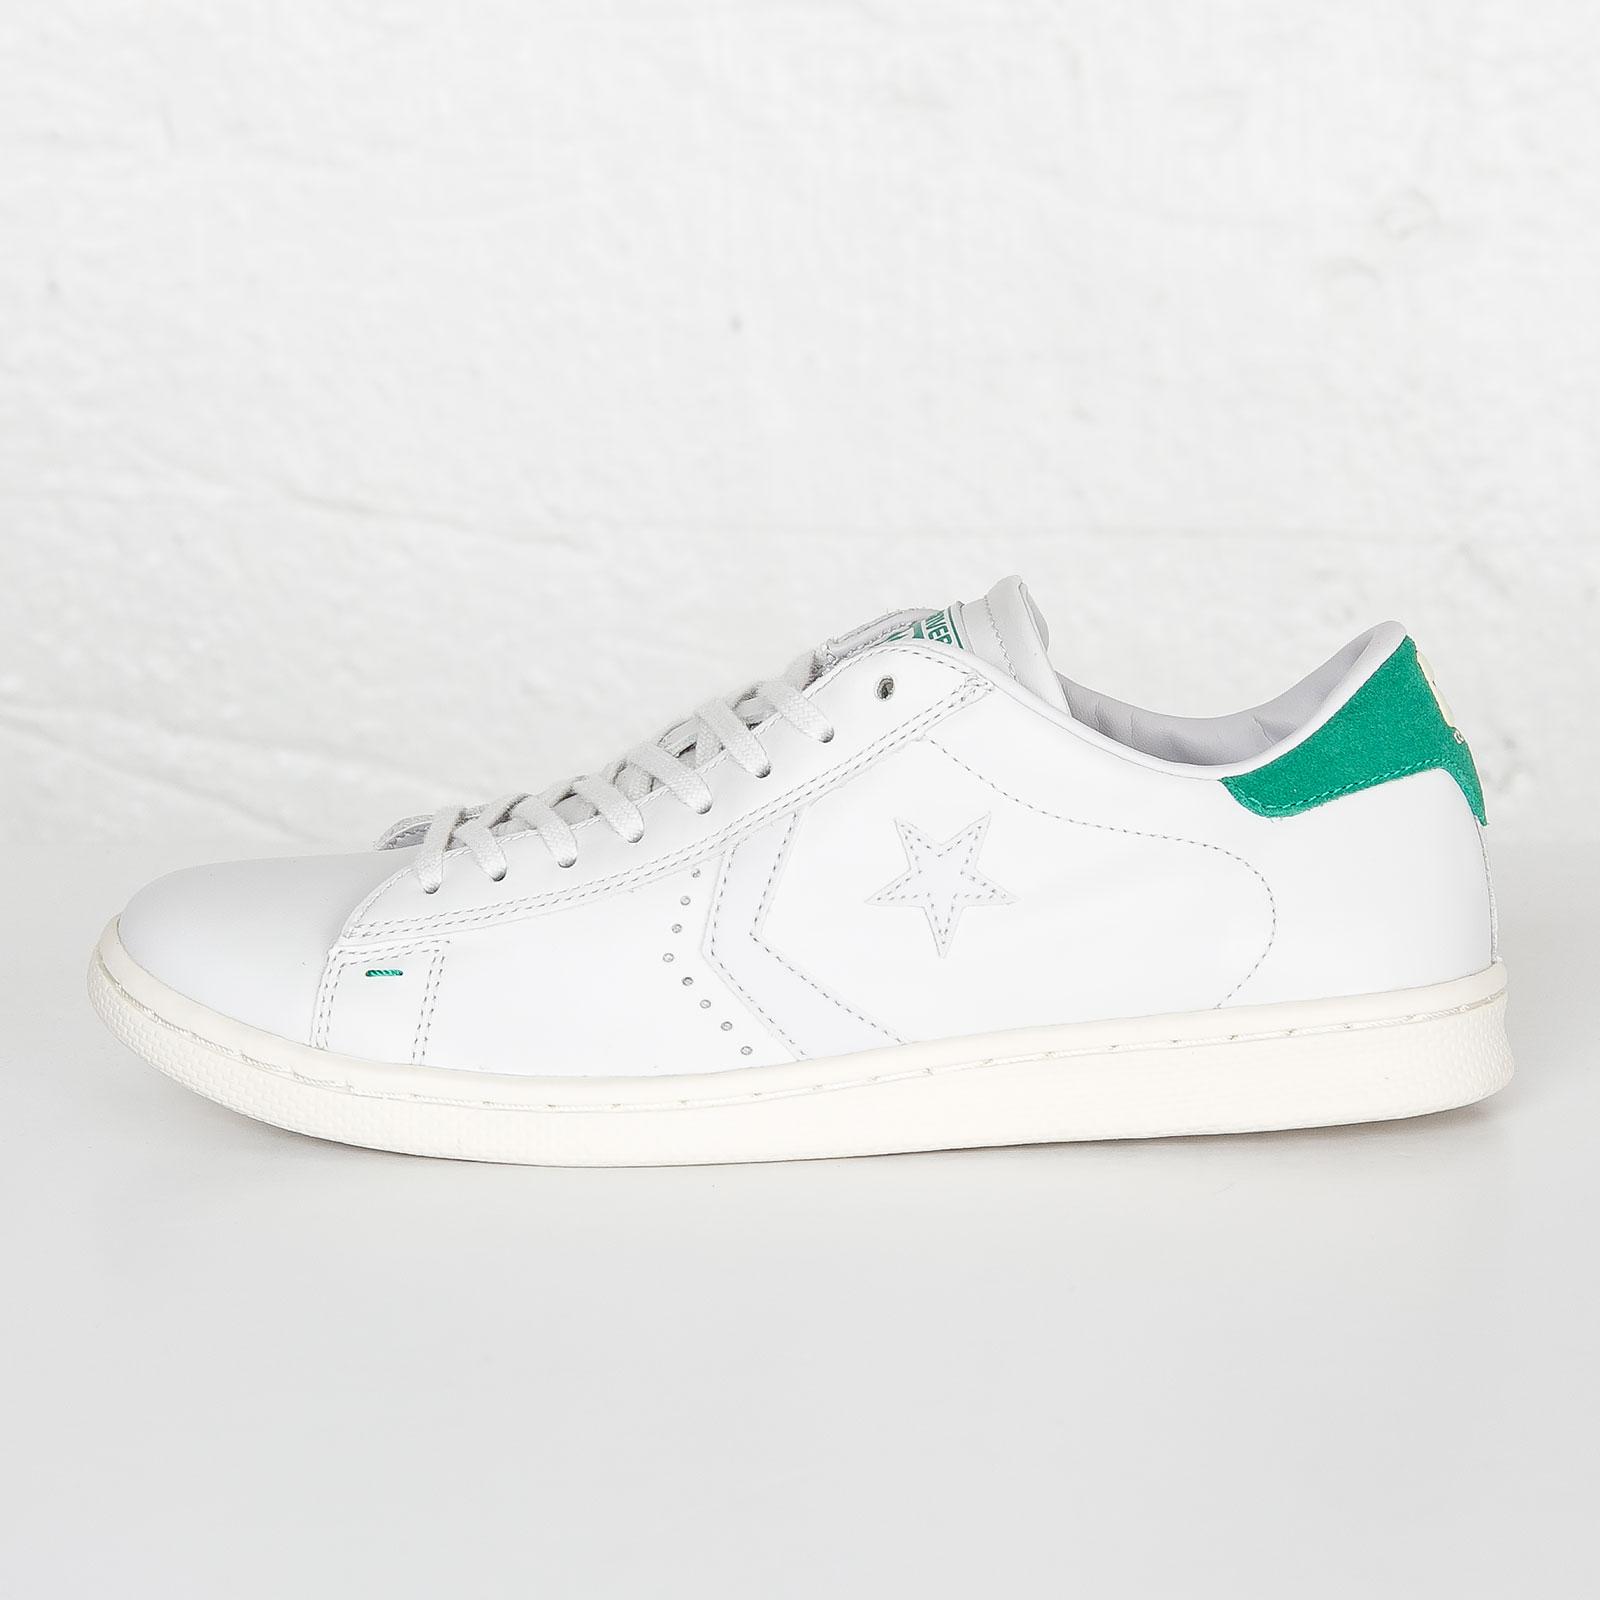 6b7347854e8e7a Converse Pro Leather LP - 148556c - Sneakersnstuff